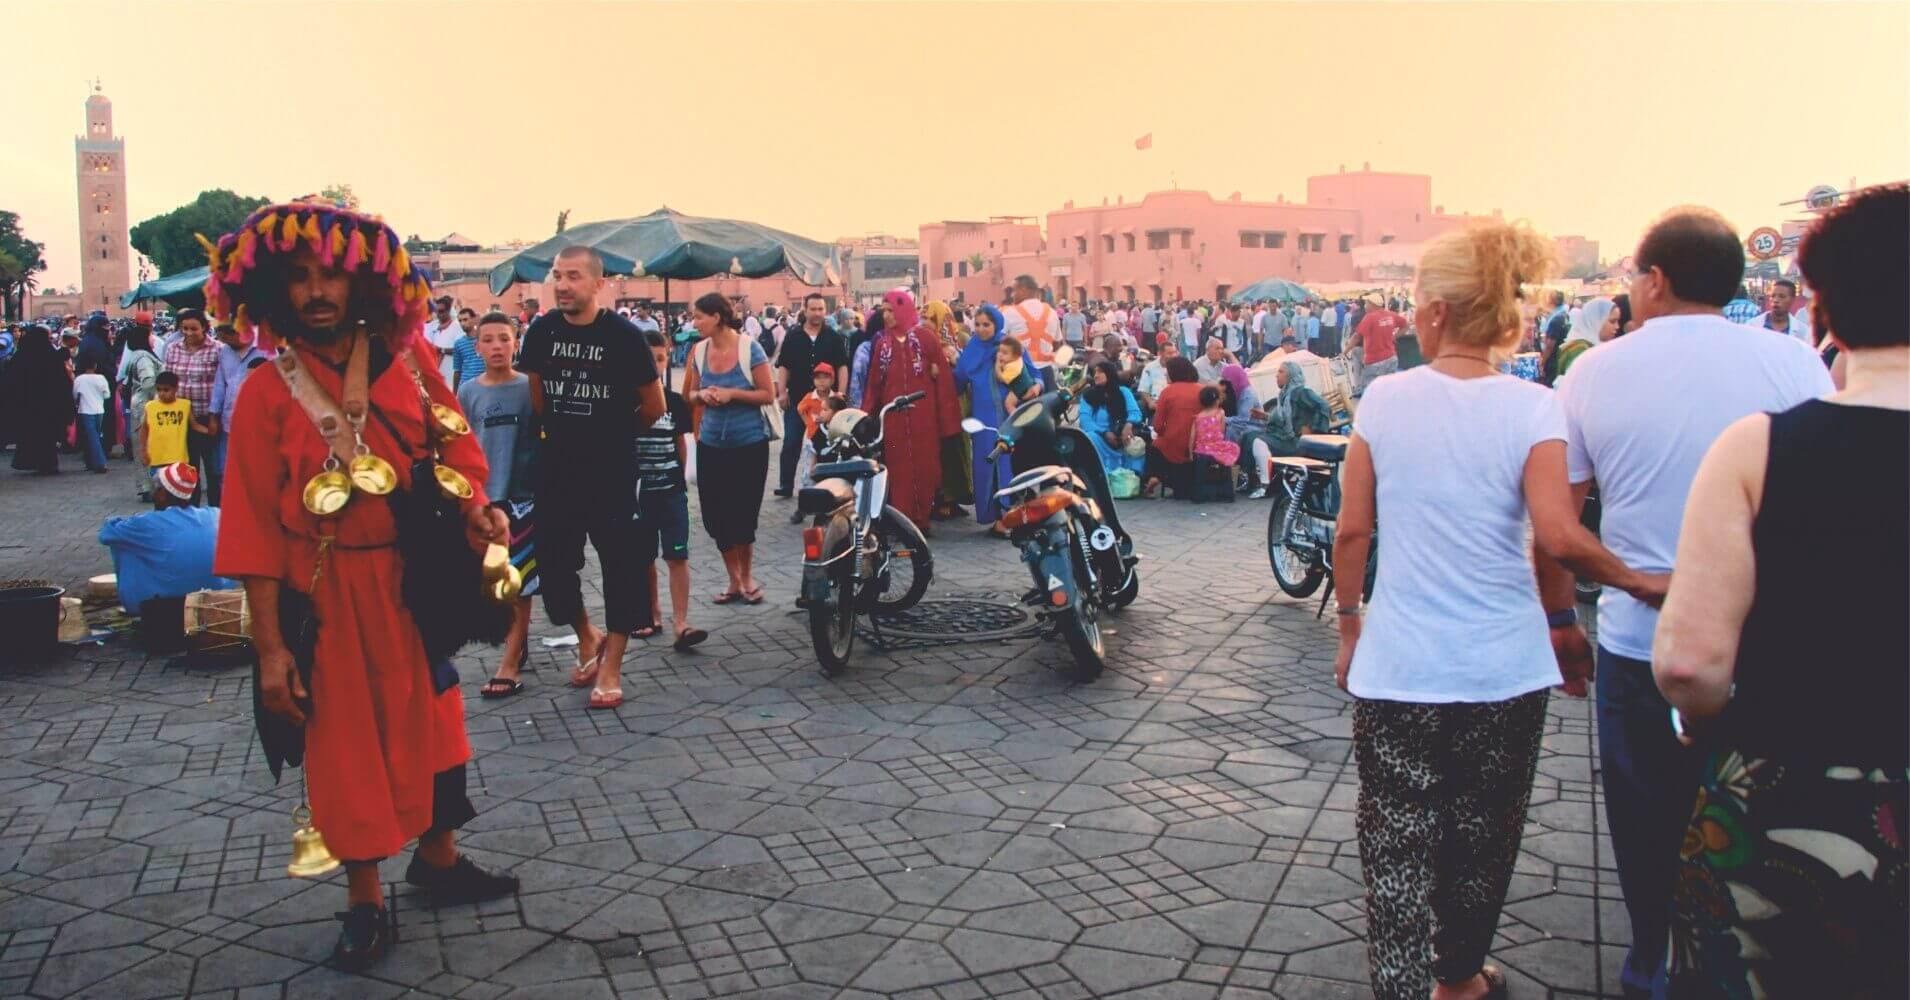 Aguador en la Plaza de Jamaa el Fna, Marrakech. Marruecos.